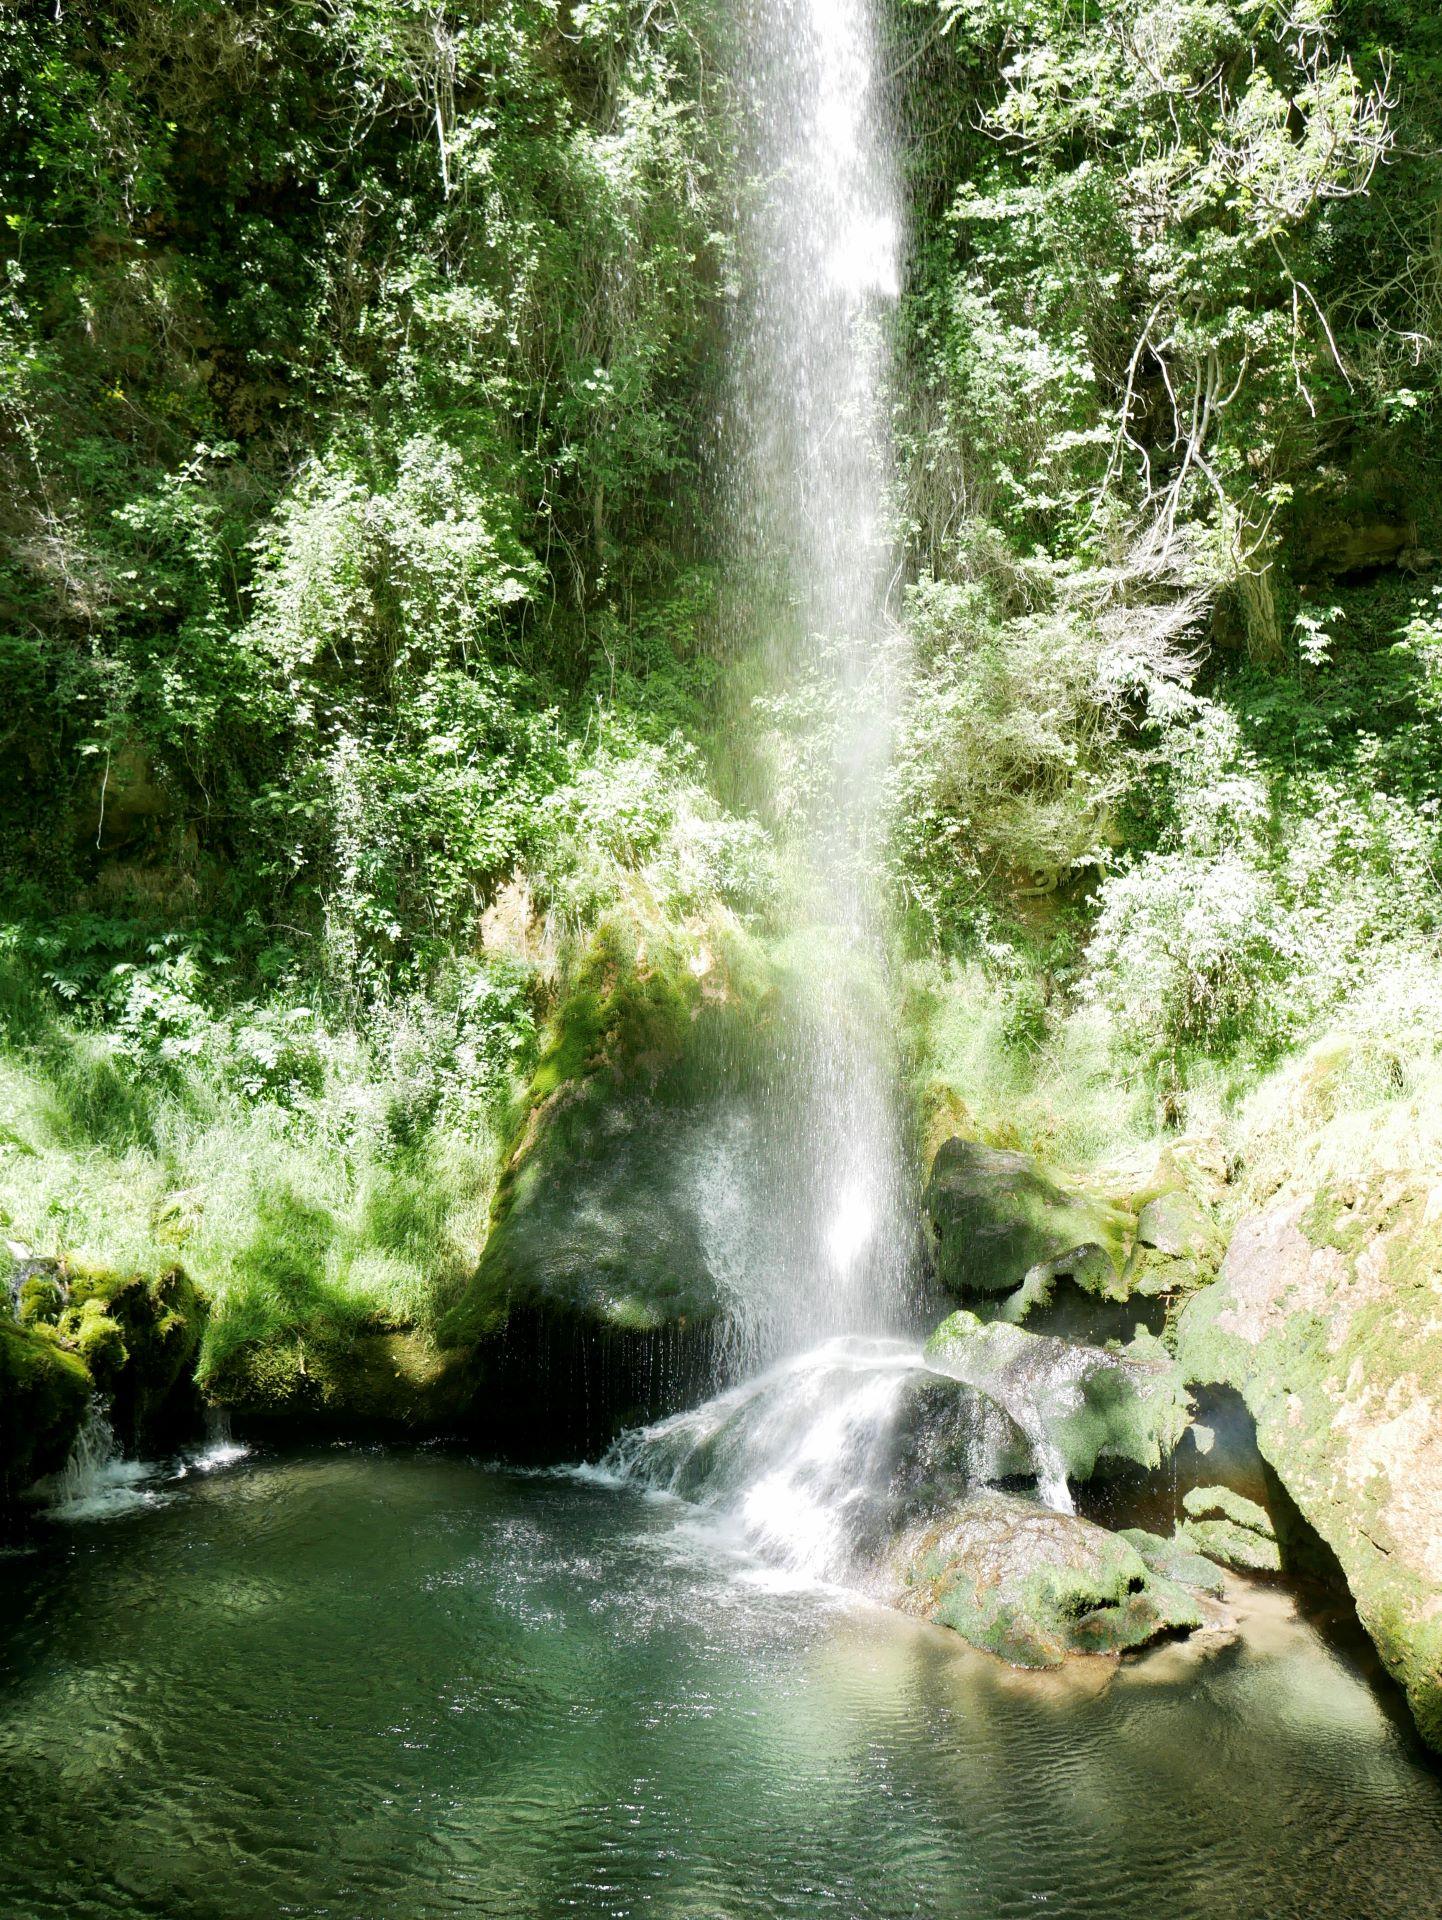 Balade drome : chute de la pissoire